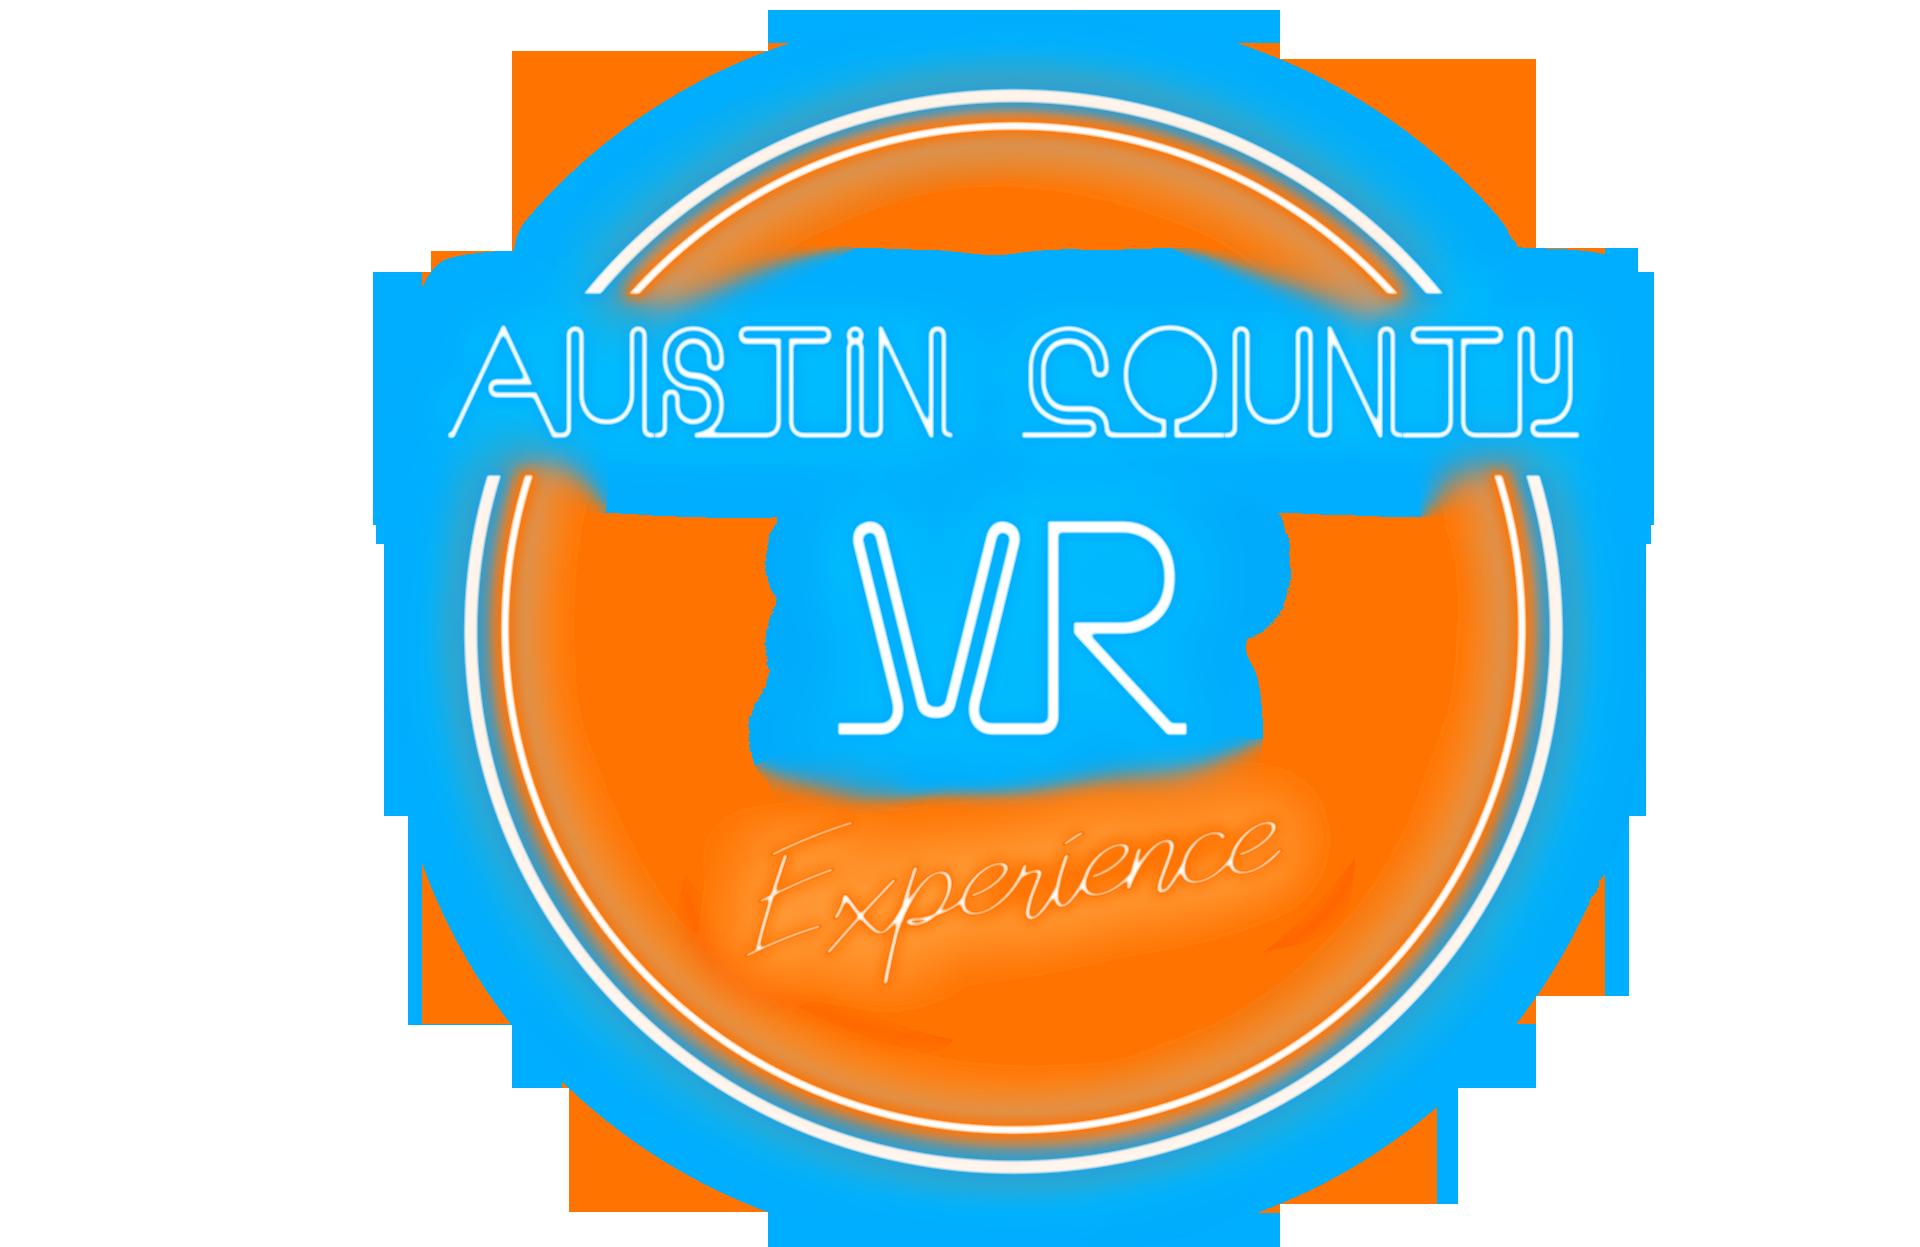 Austin County VR